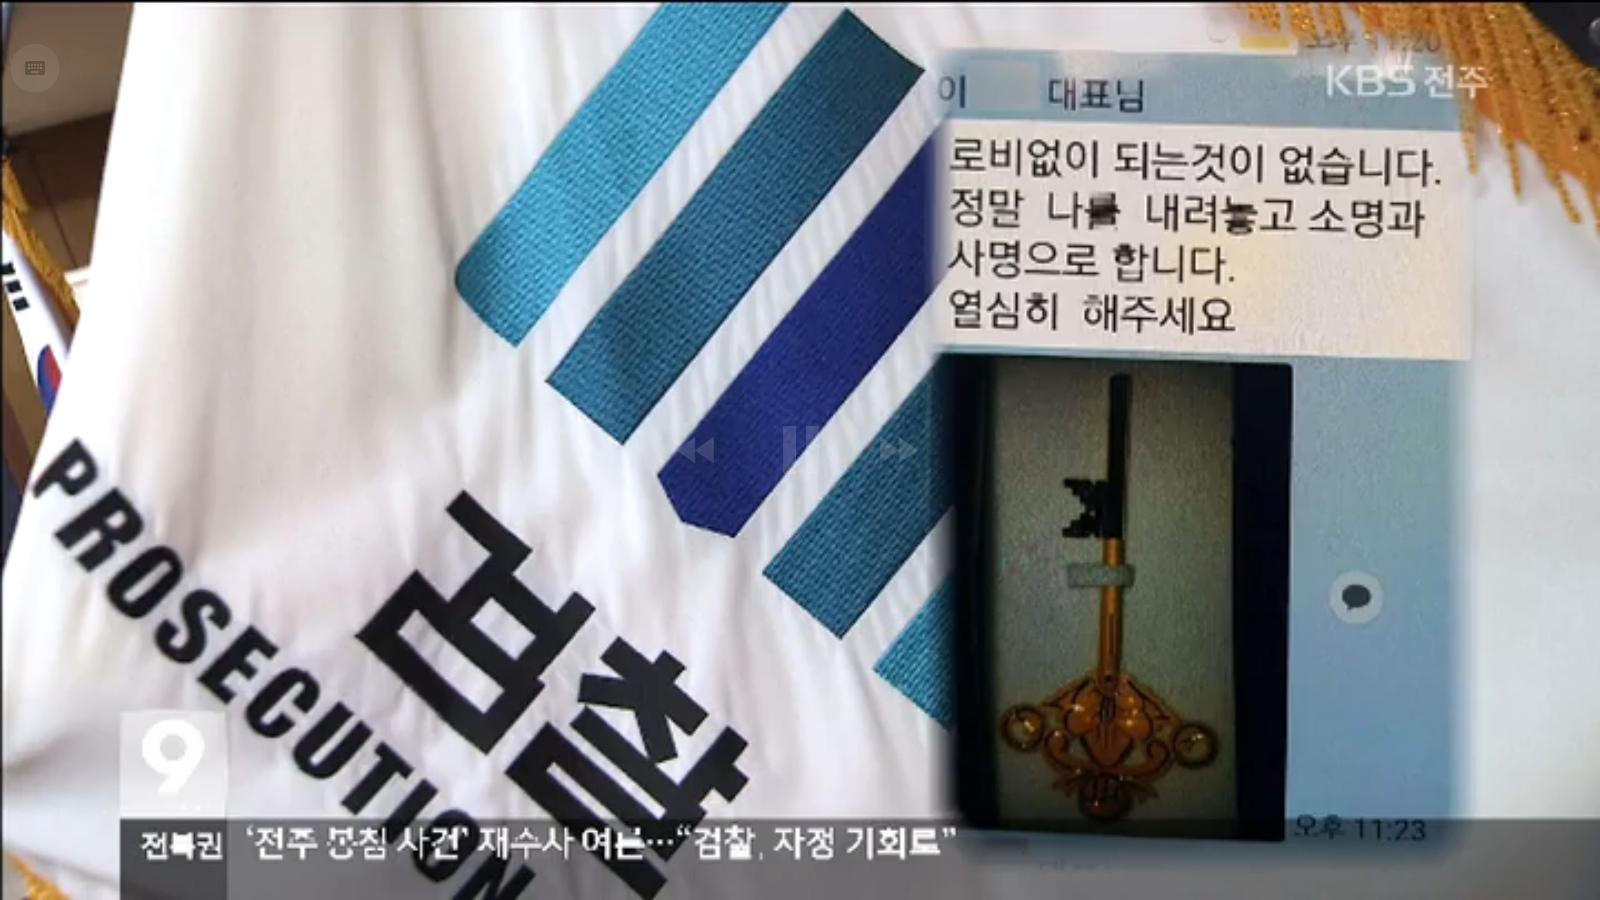 [18.3.30 KBS전주] 전주봉침게이트, 방대한 자료 확보... 그러나 공소장은3.jpg